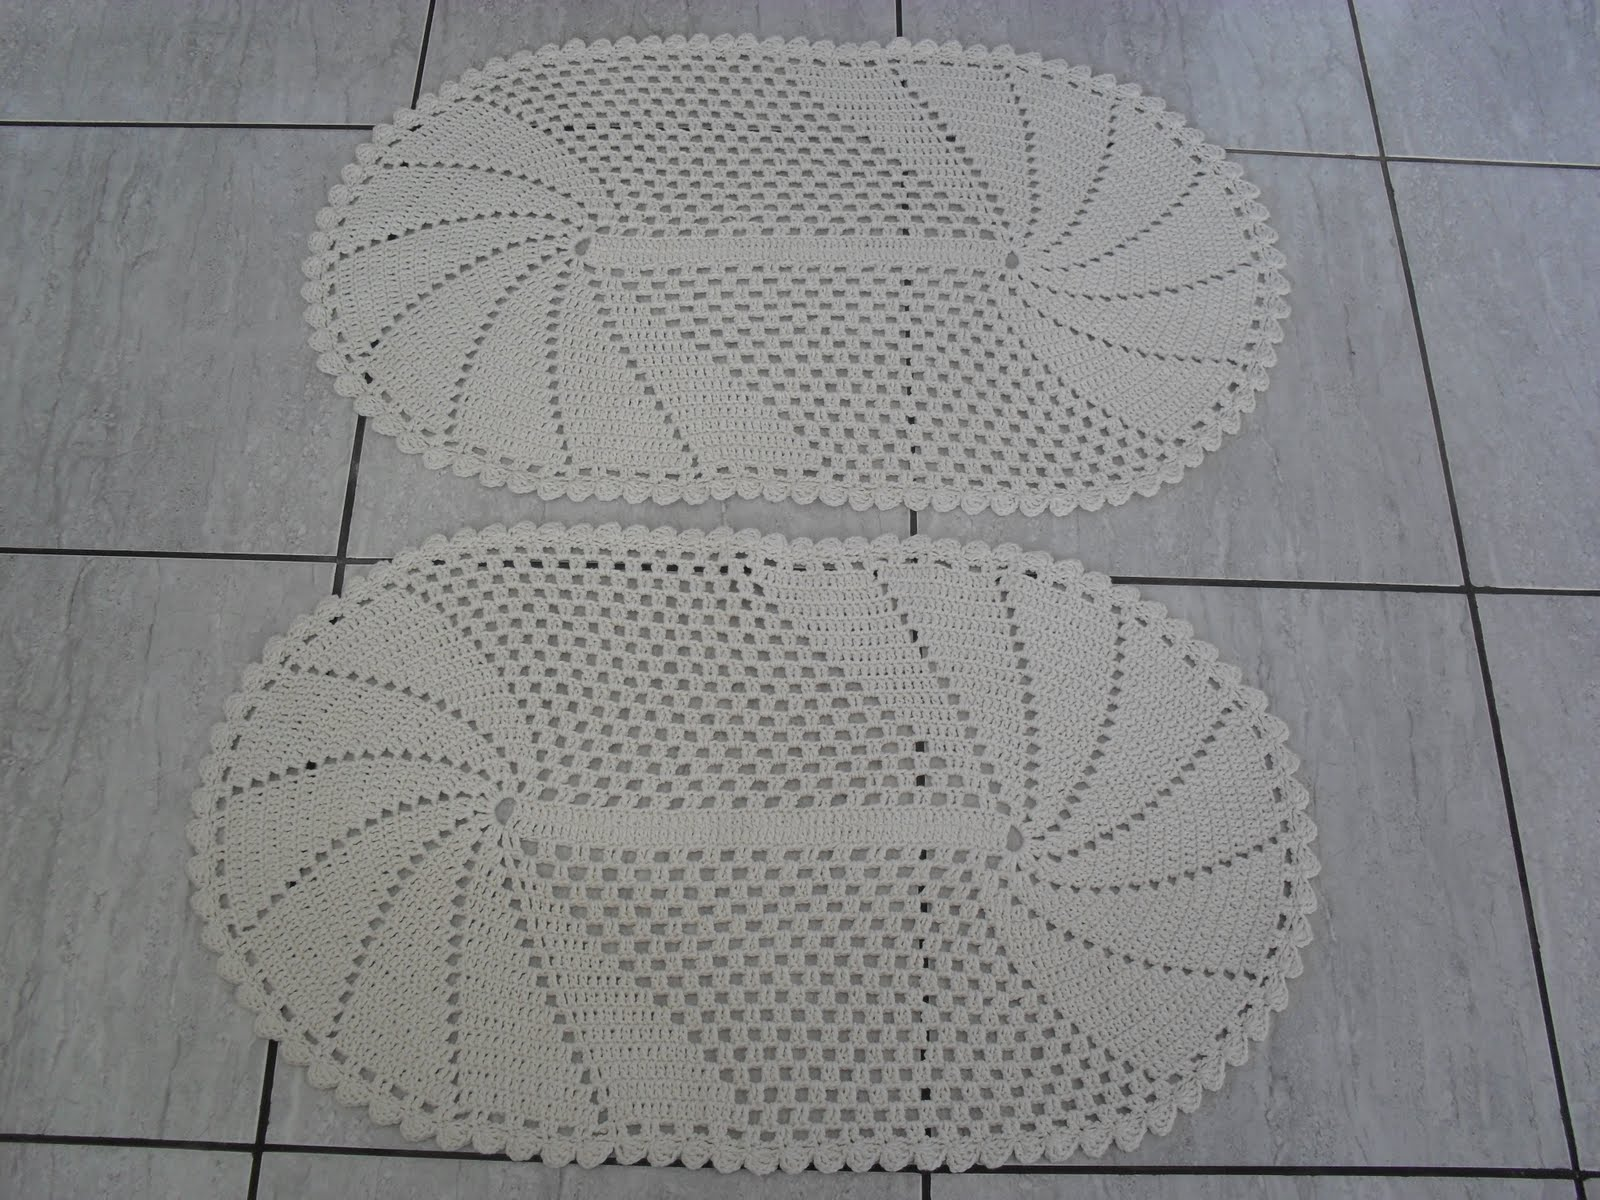 объемный коврик схема мастер класс